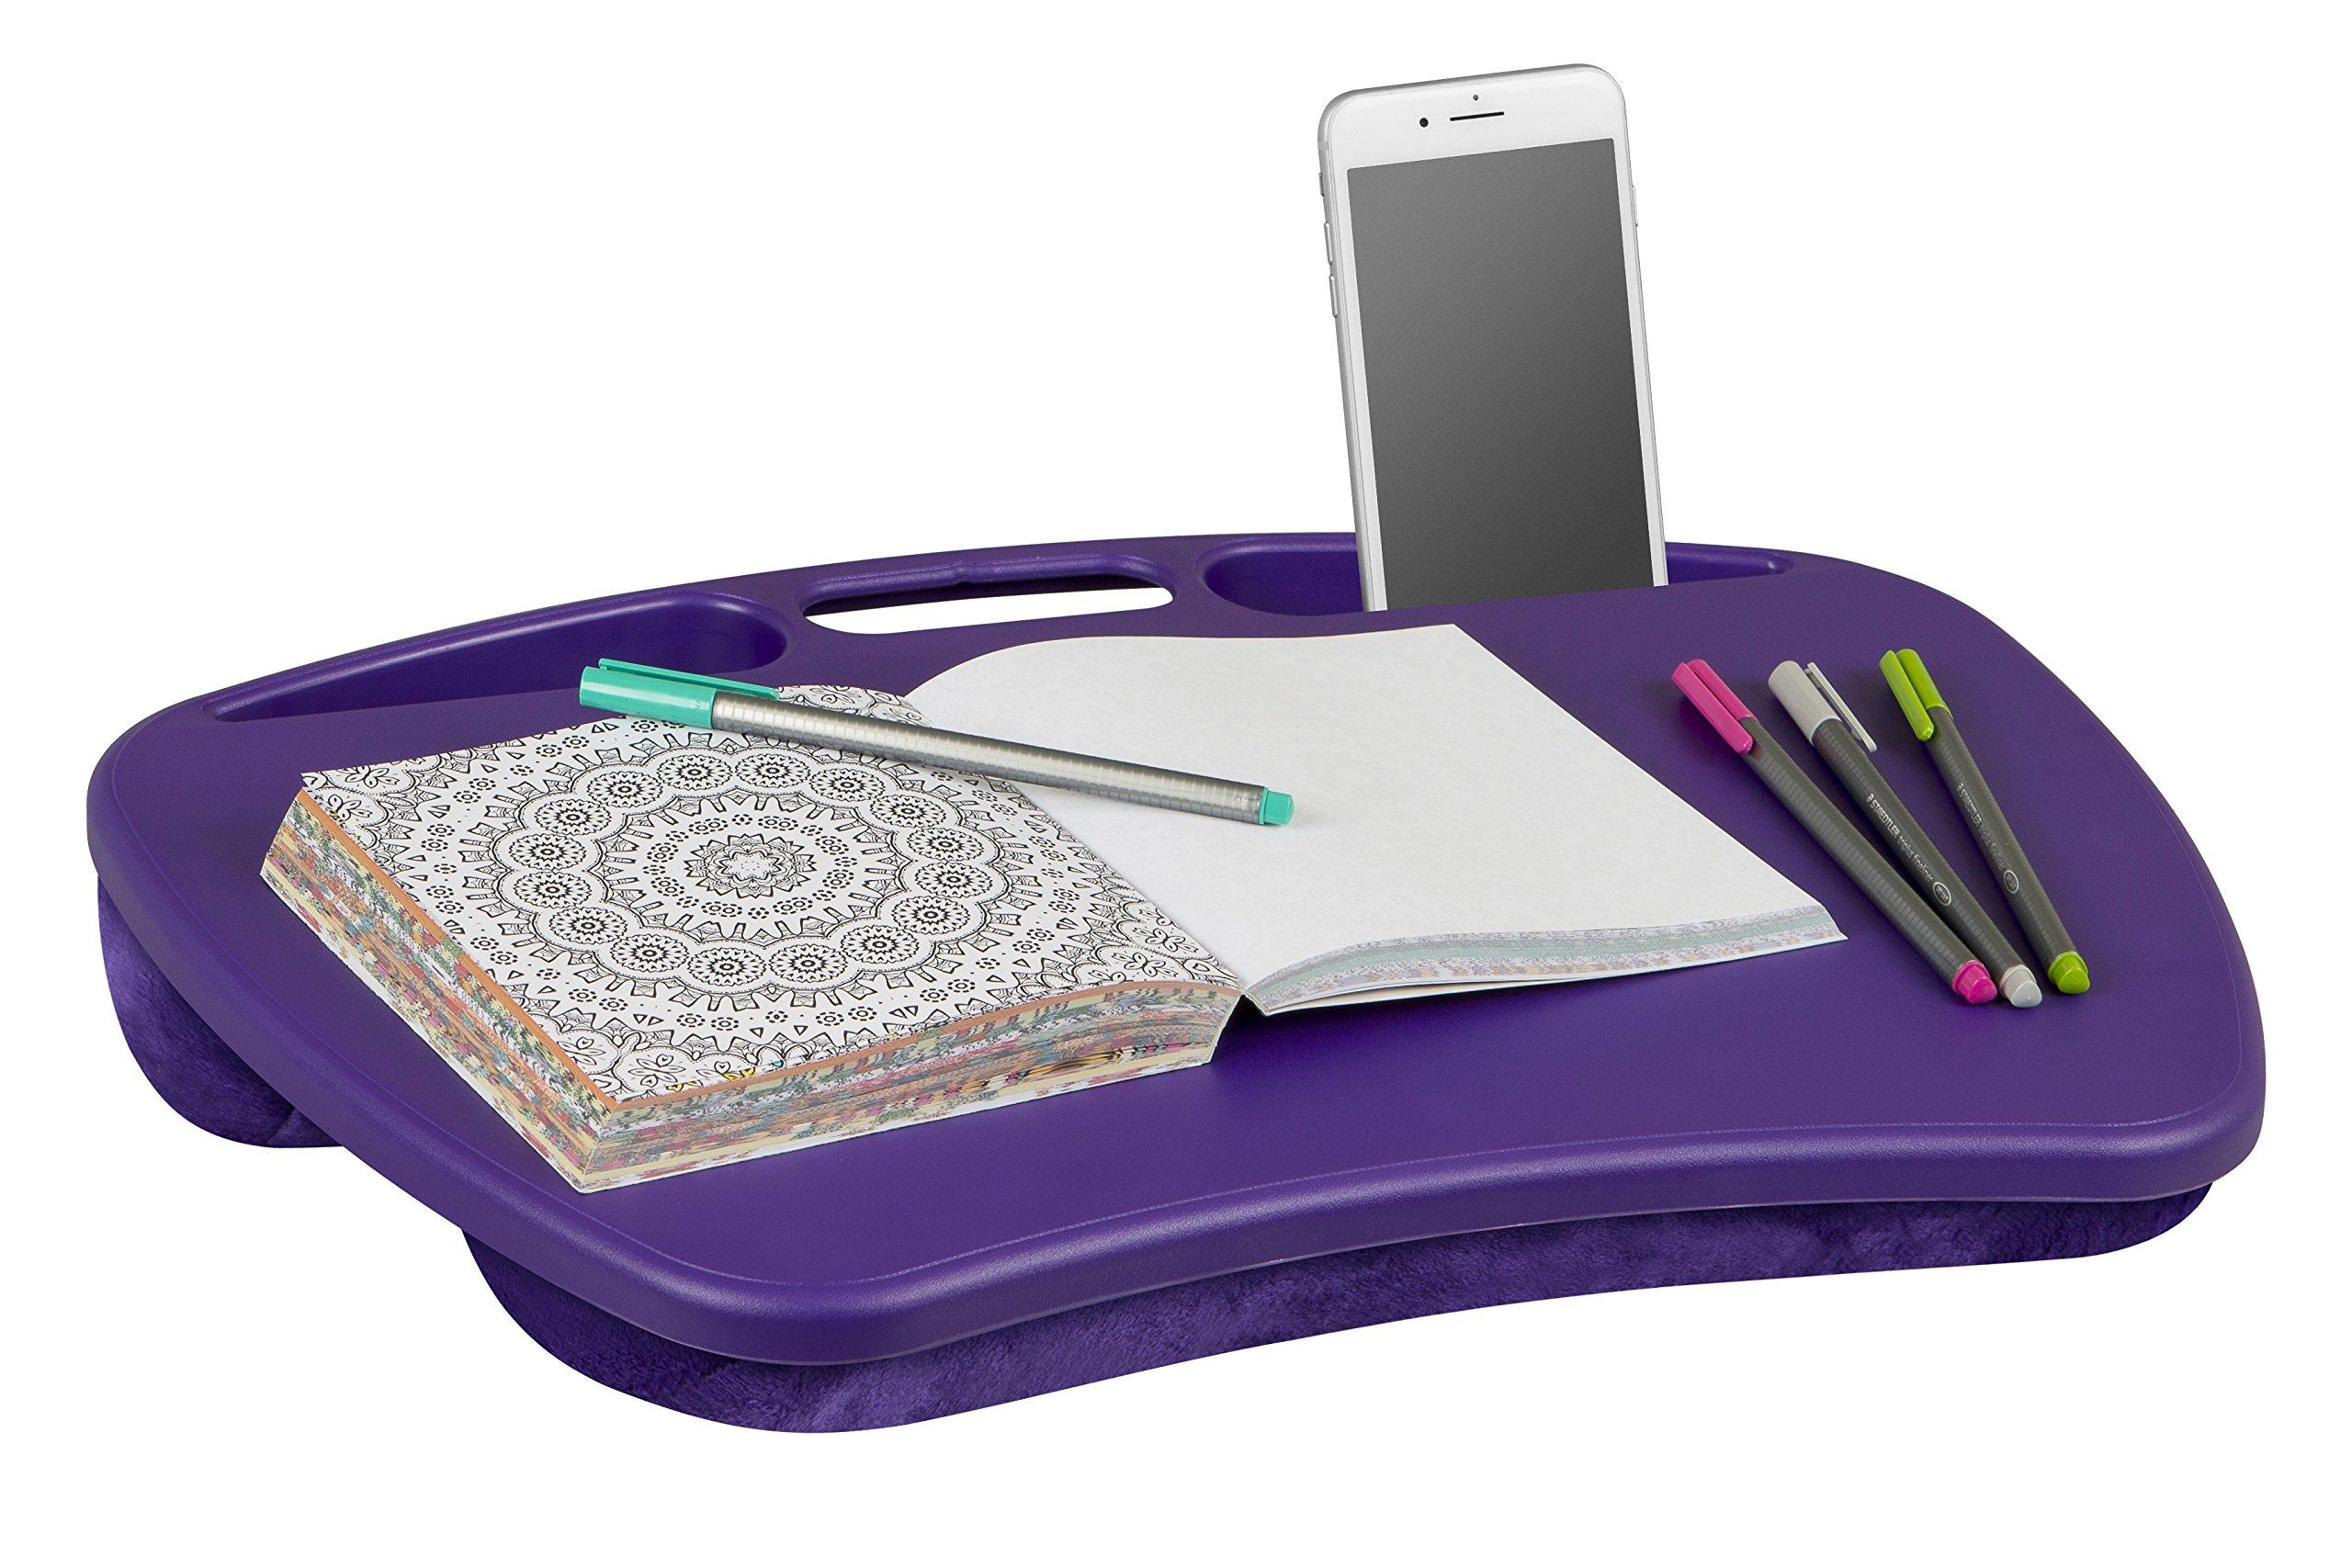 LapGear MyDesk Lap Desk - Purple - Fits up to 15.6 Inch laptops - Style No. 45342 by LapGear